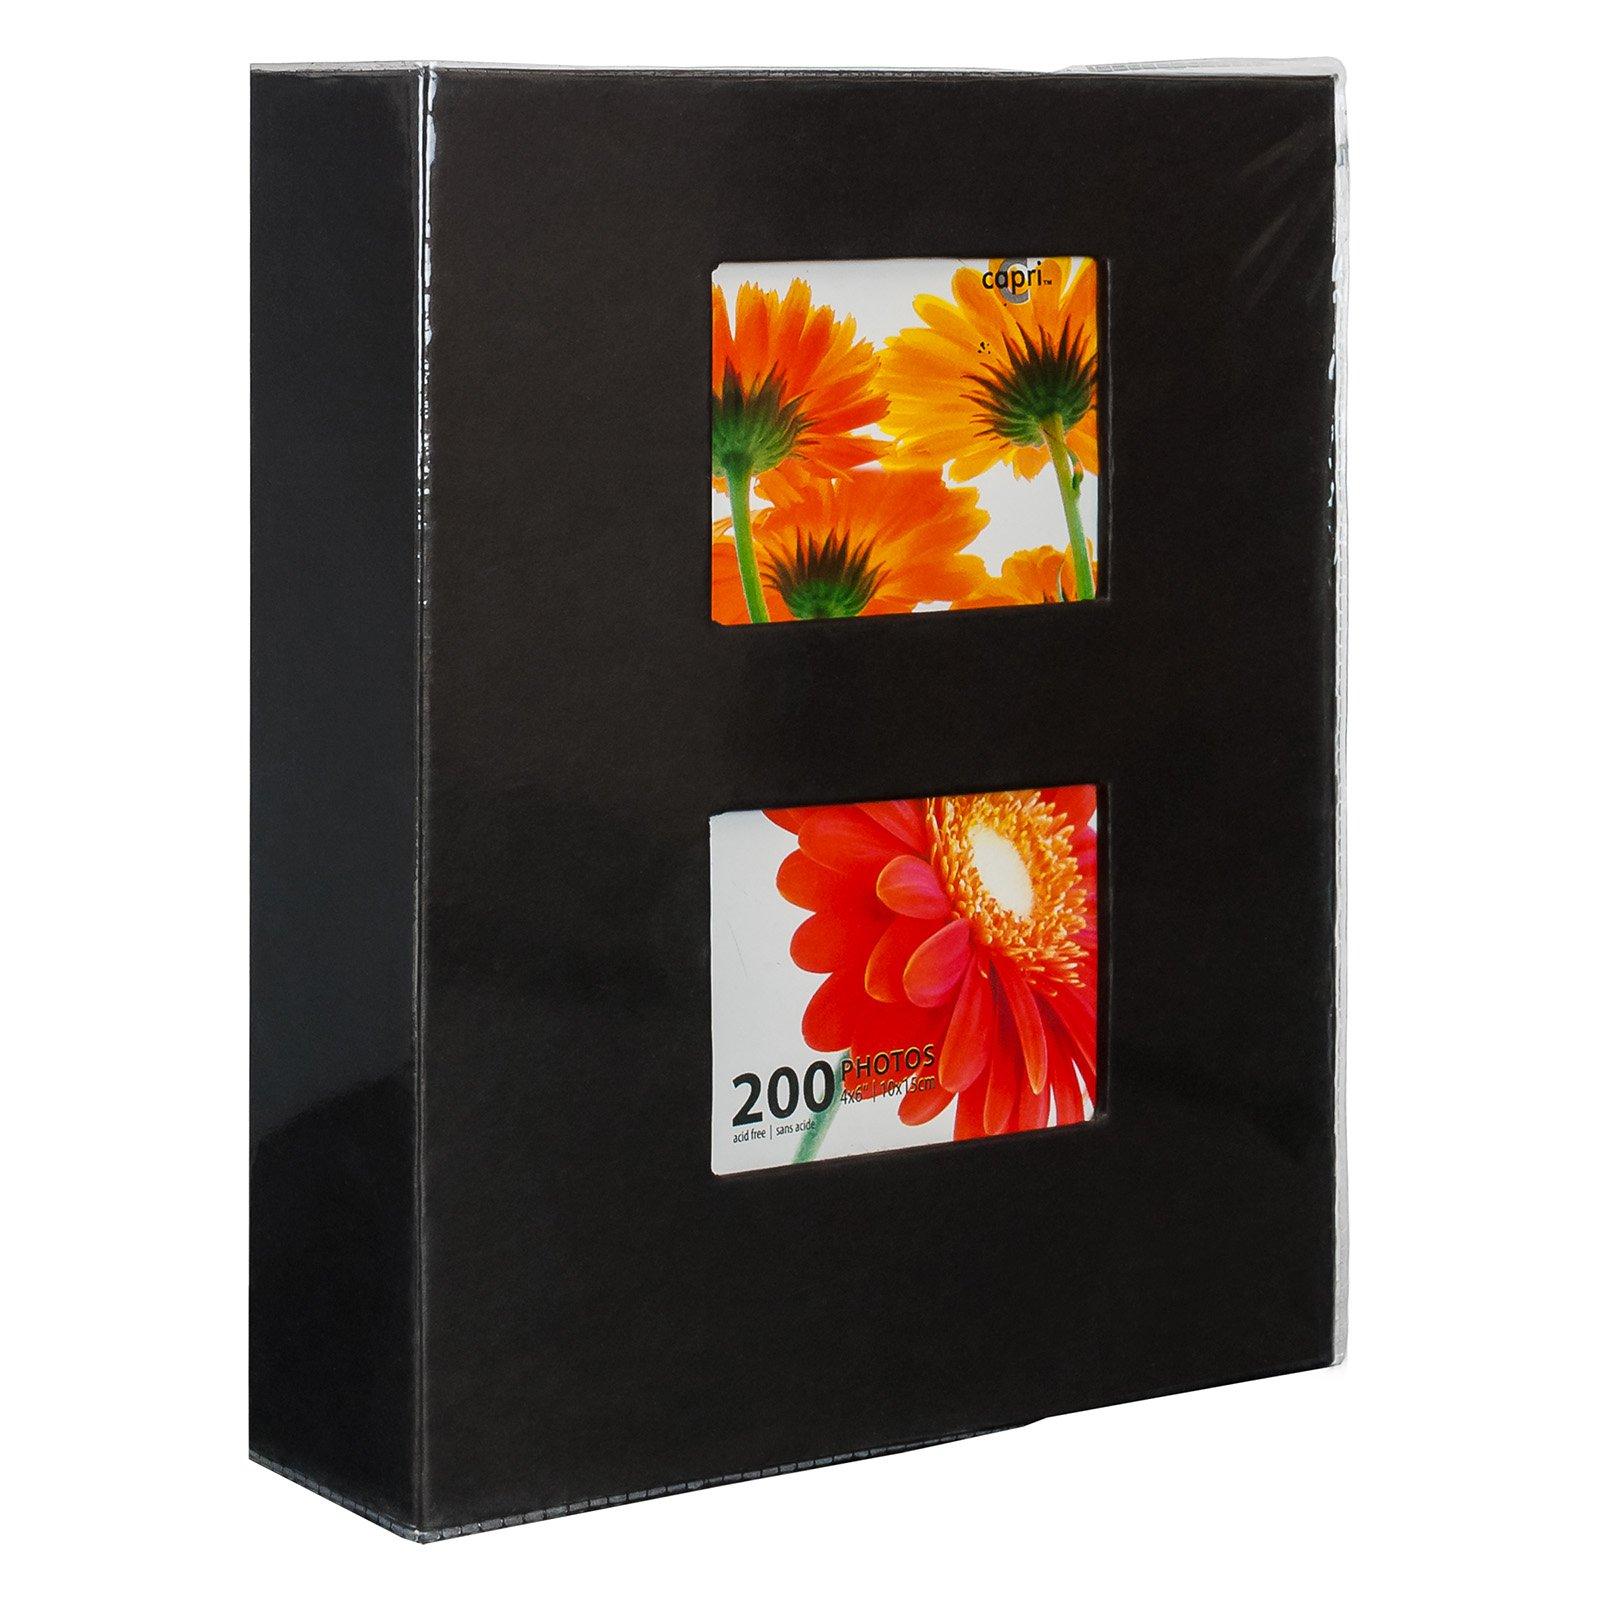 Kiera Grace Photo Album Holds 200 - 6 Pack